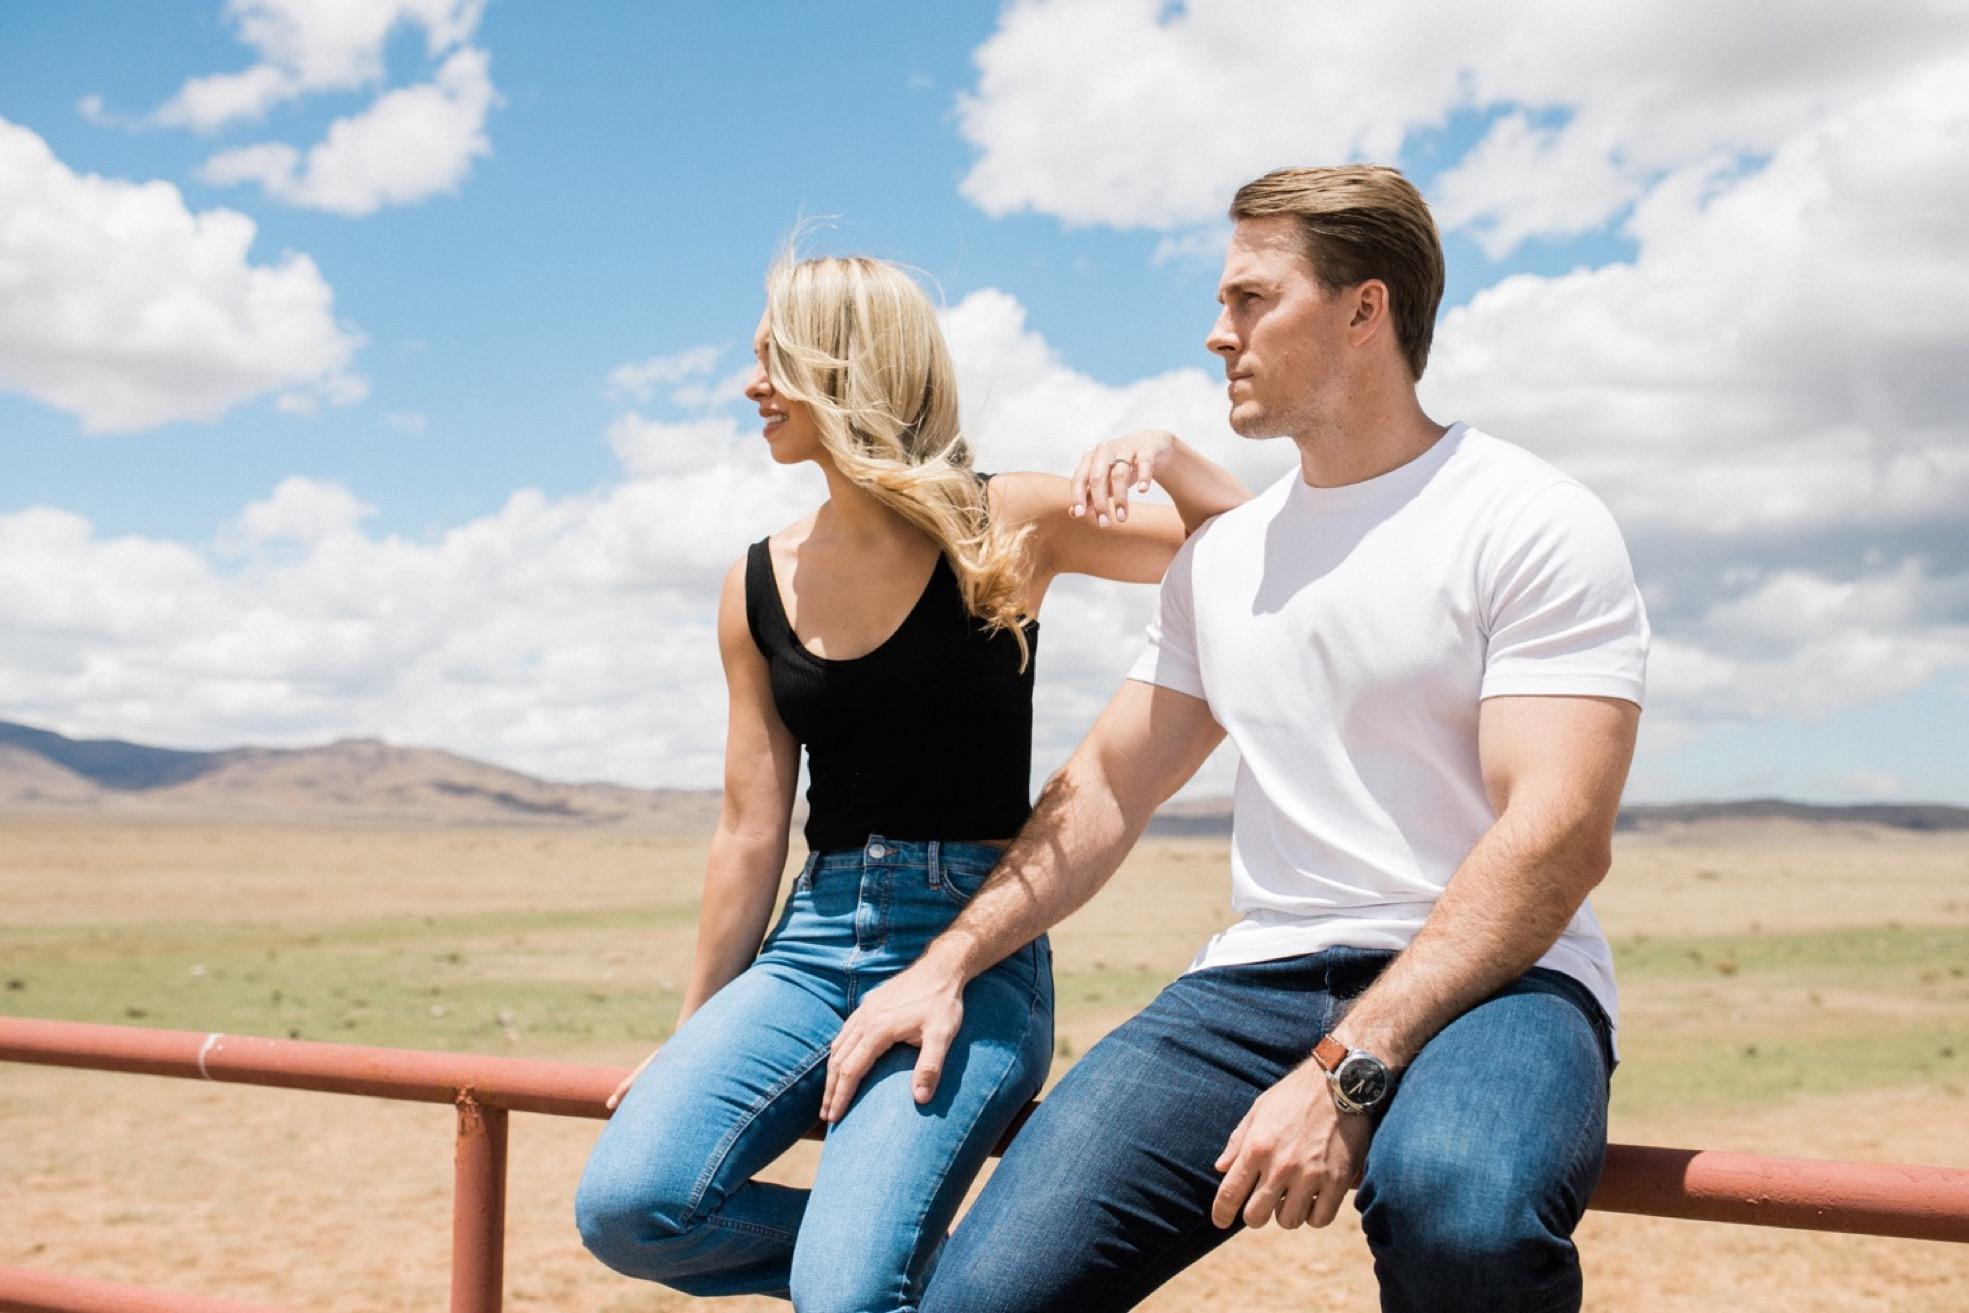 14_Marfa-Texas-Engagement-Jessica-Sherrell-184.jpg